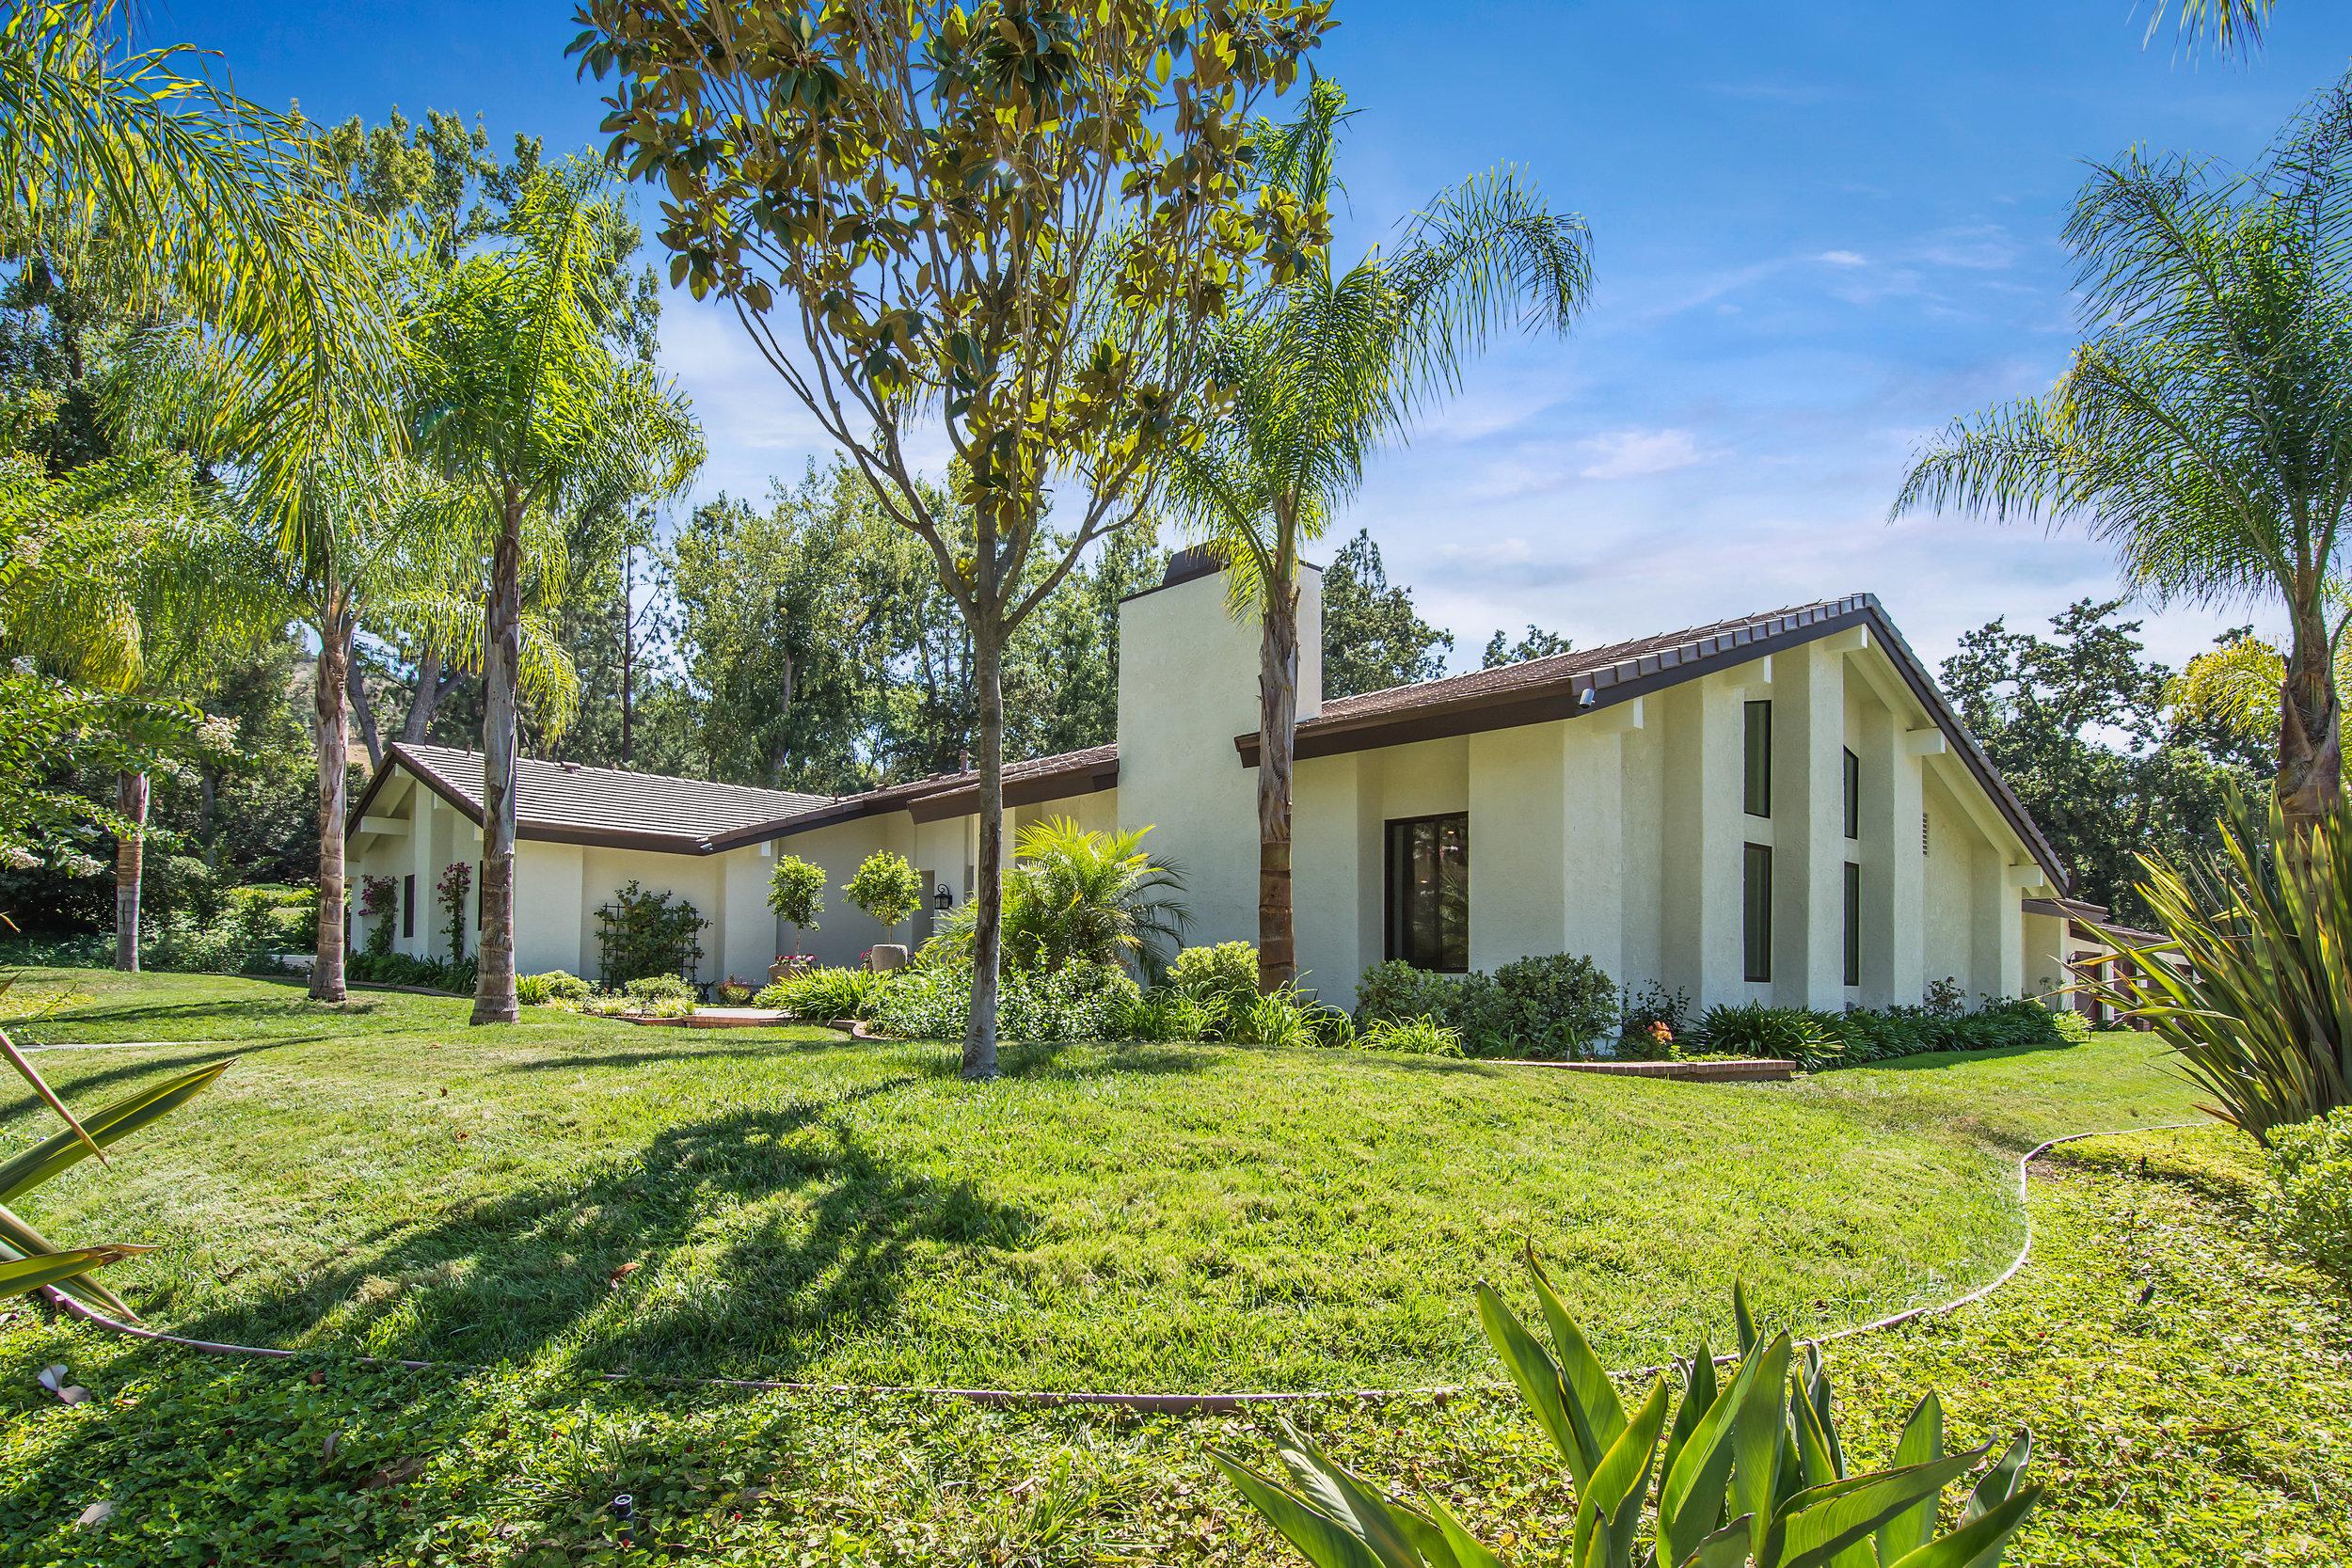 4219 Saddlecrest Lane, Westlake Village, CA 91361 - $2,248,000